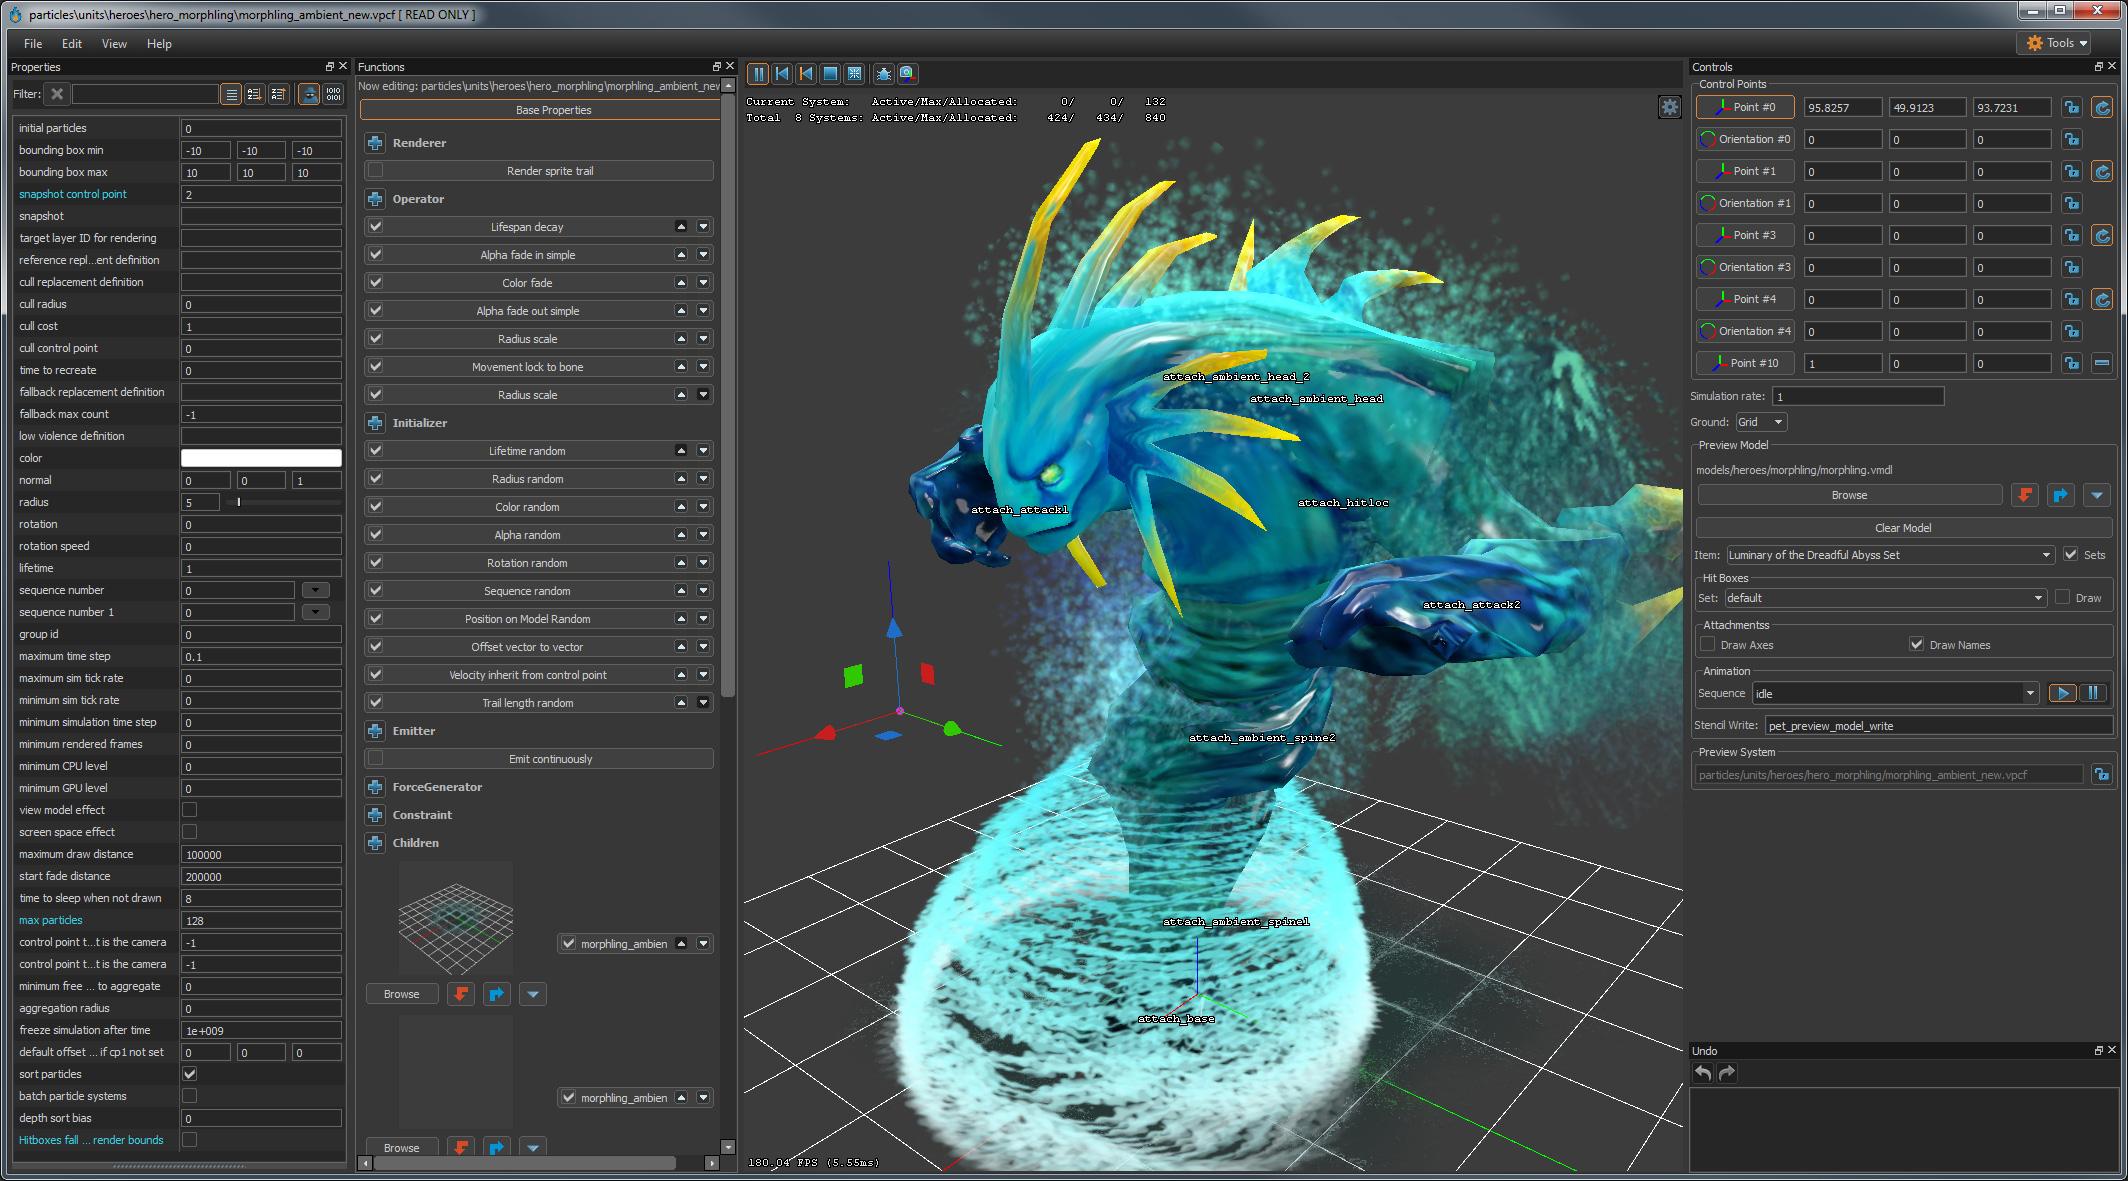 Dota 2 reborn 3d model editor